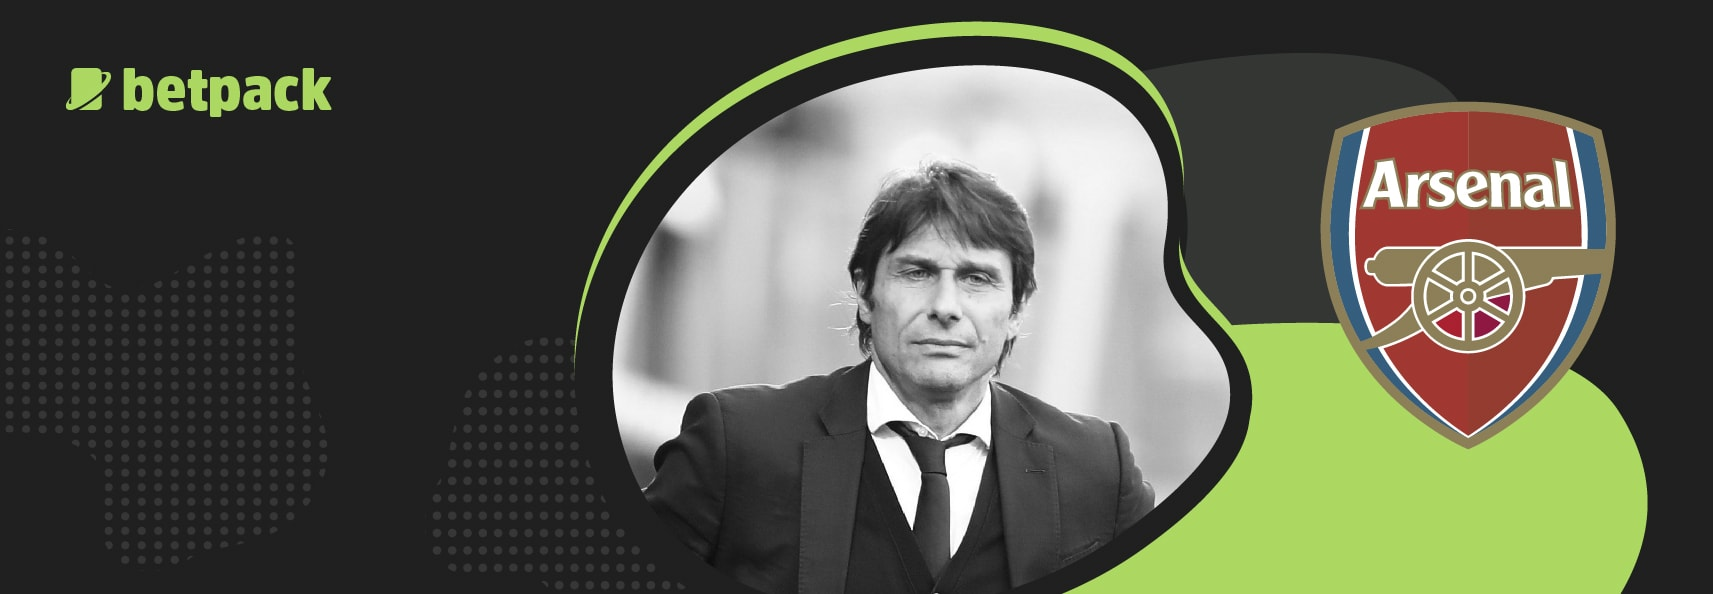 No agreement between Antonio Conte and Arsenal